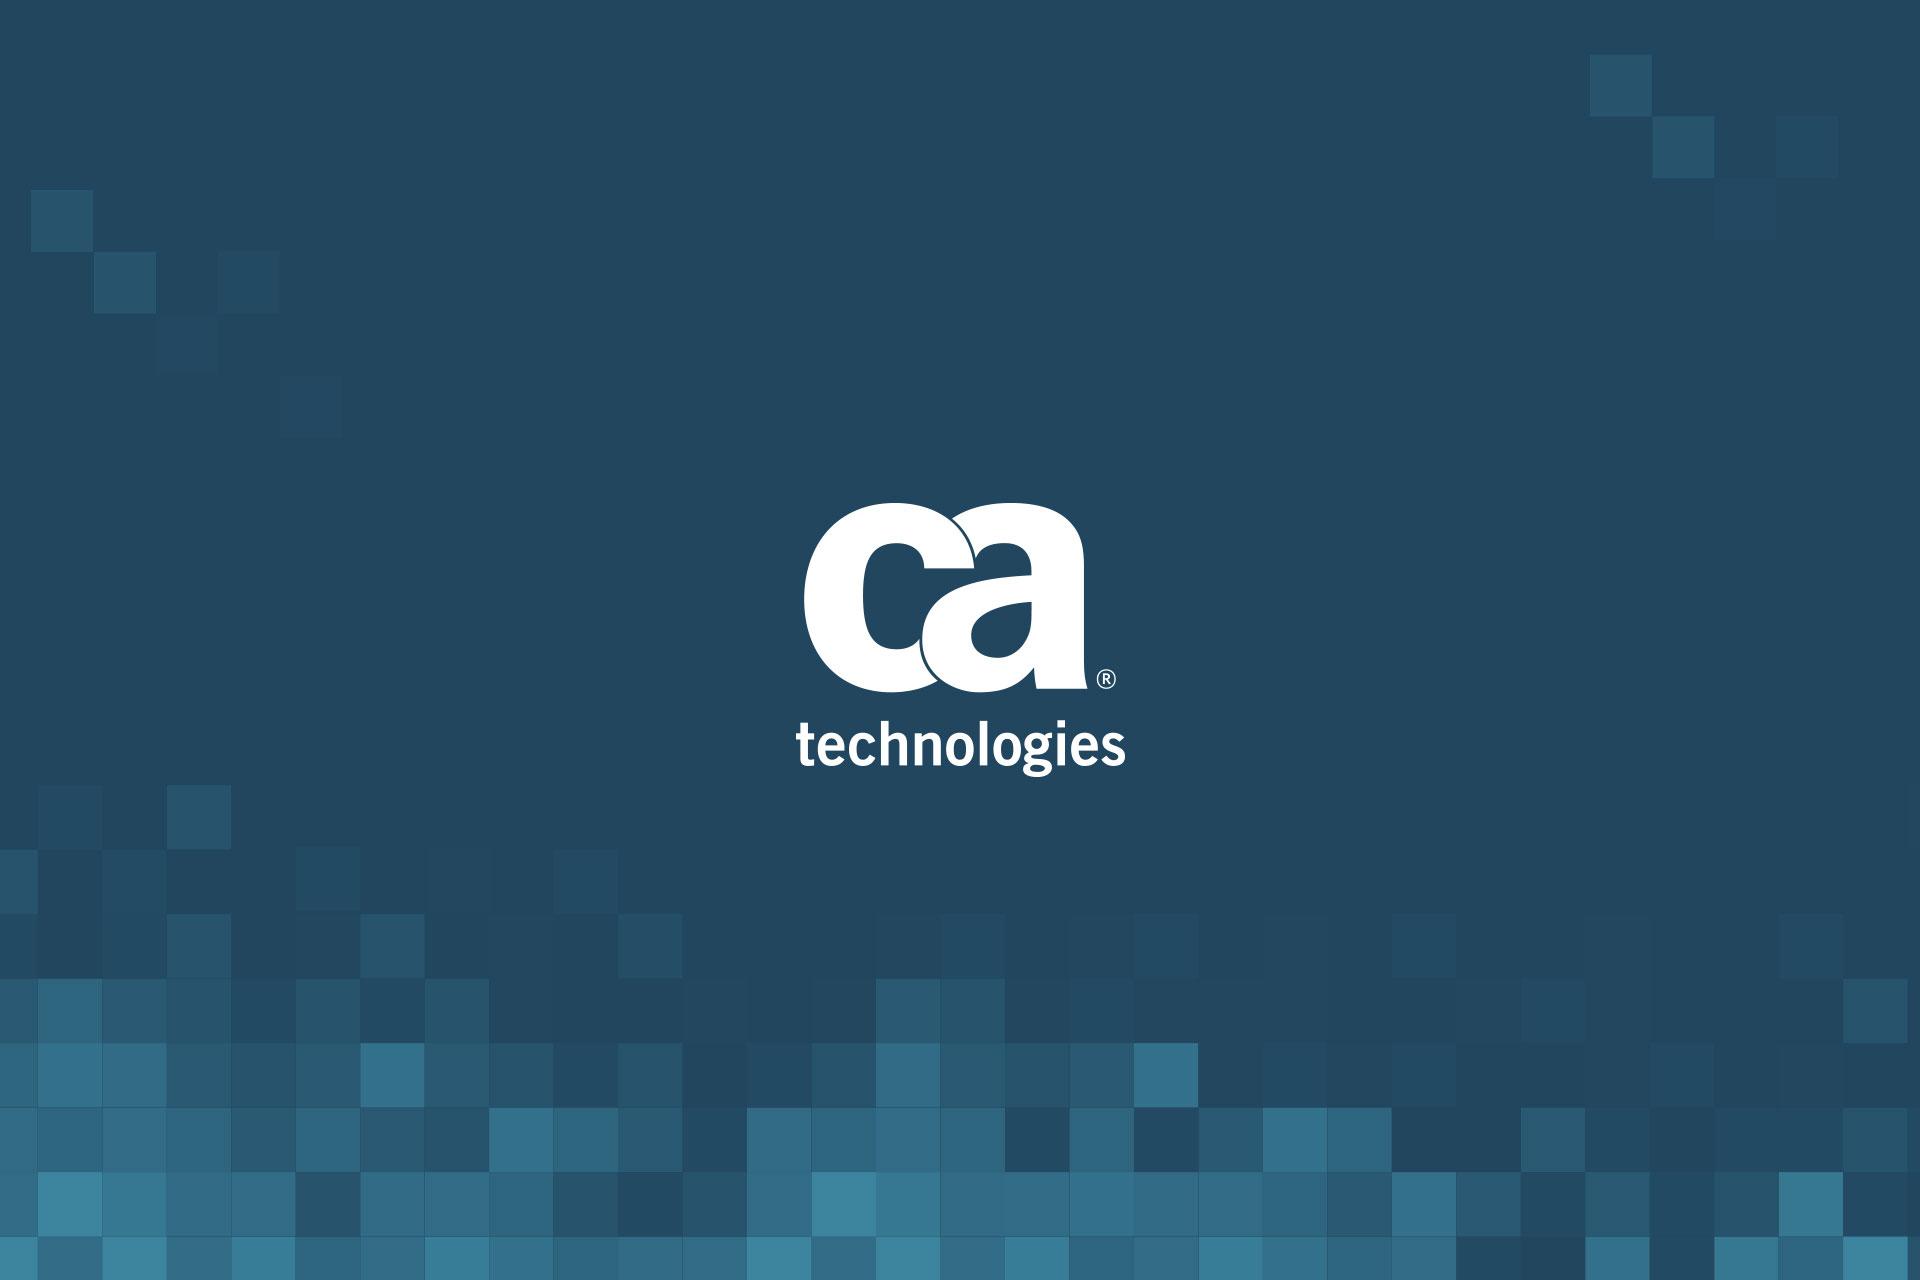 ESCR_CATechnologies_2